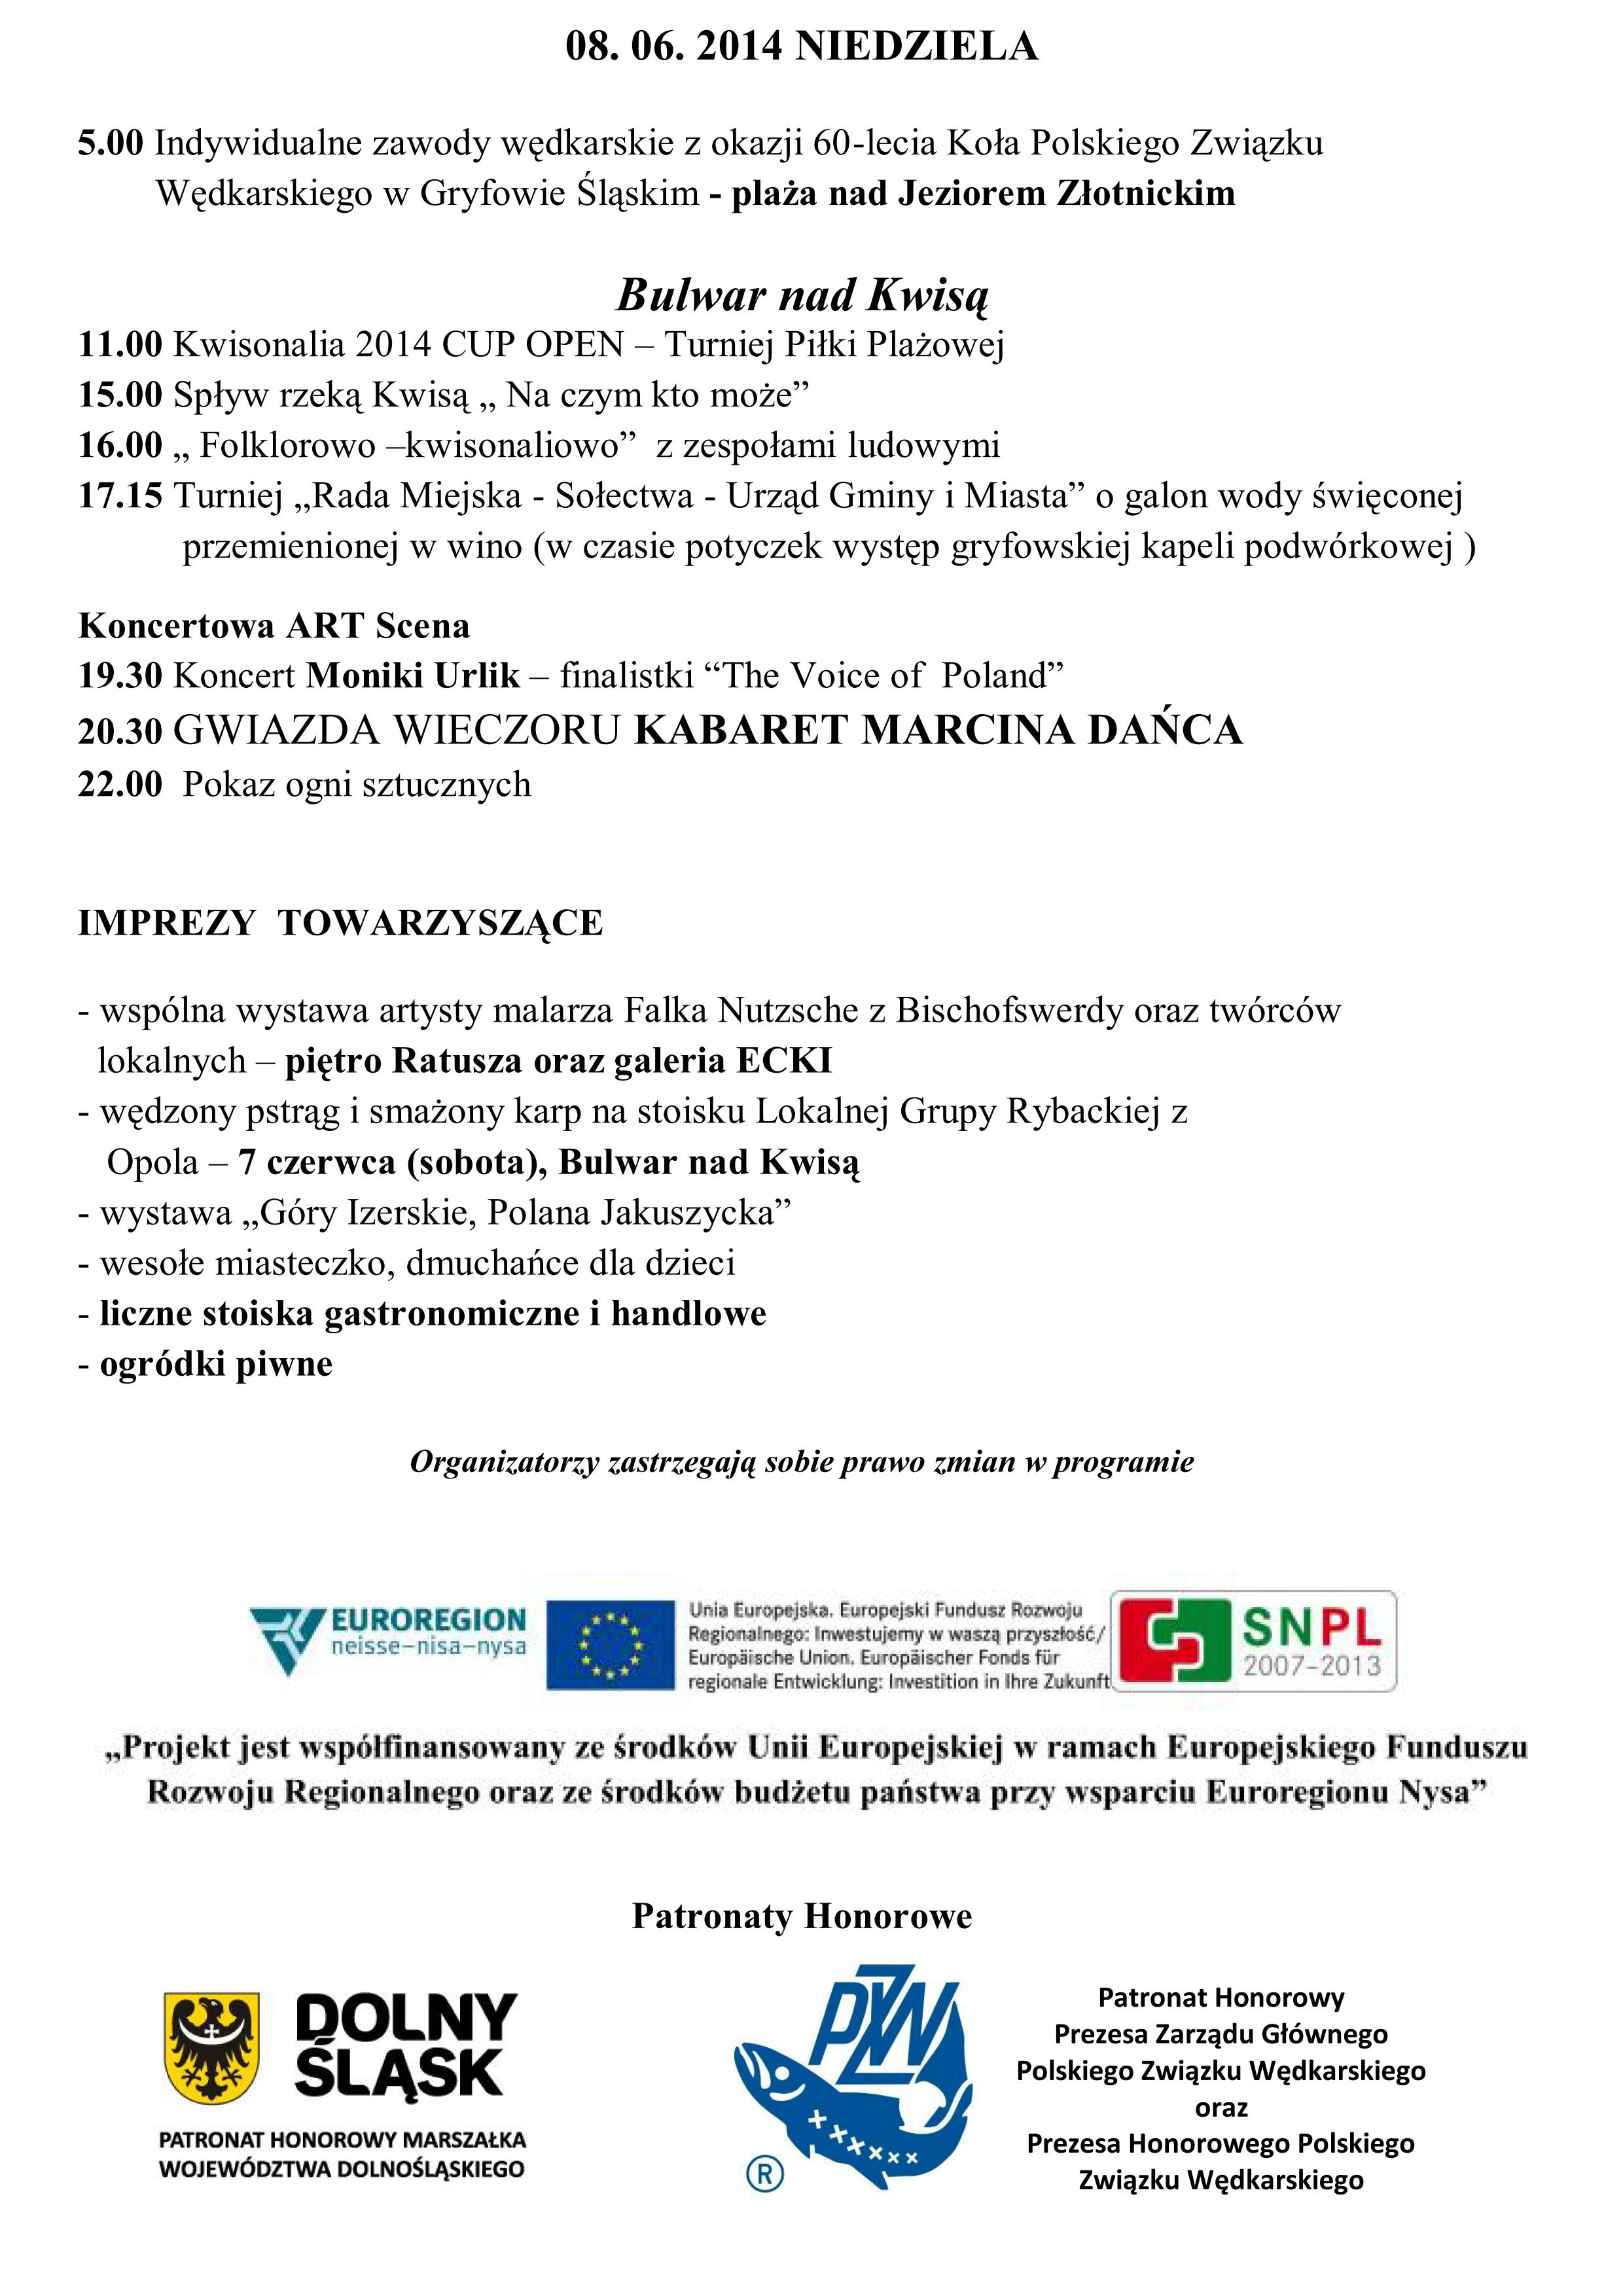 KWISONALIA 2014 program aktualny na 16 MAJA_04